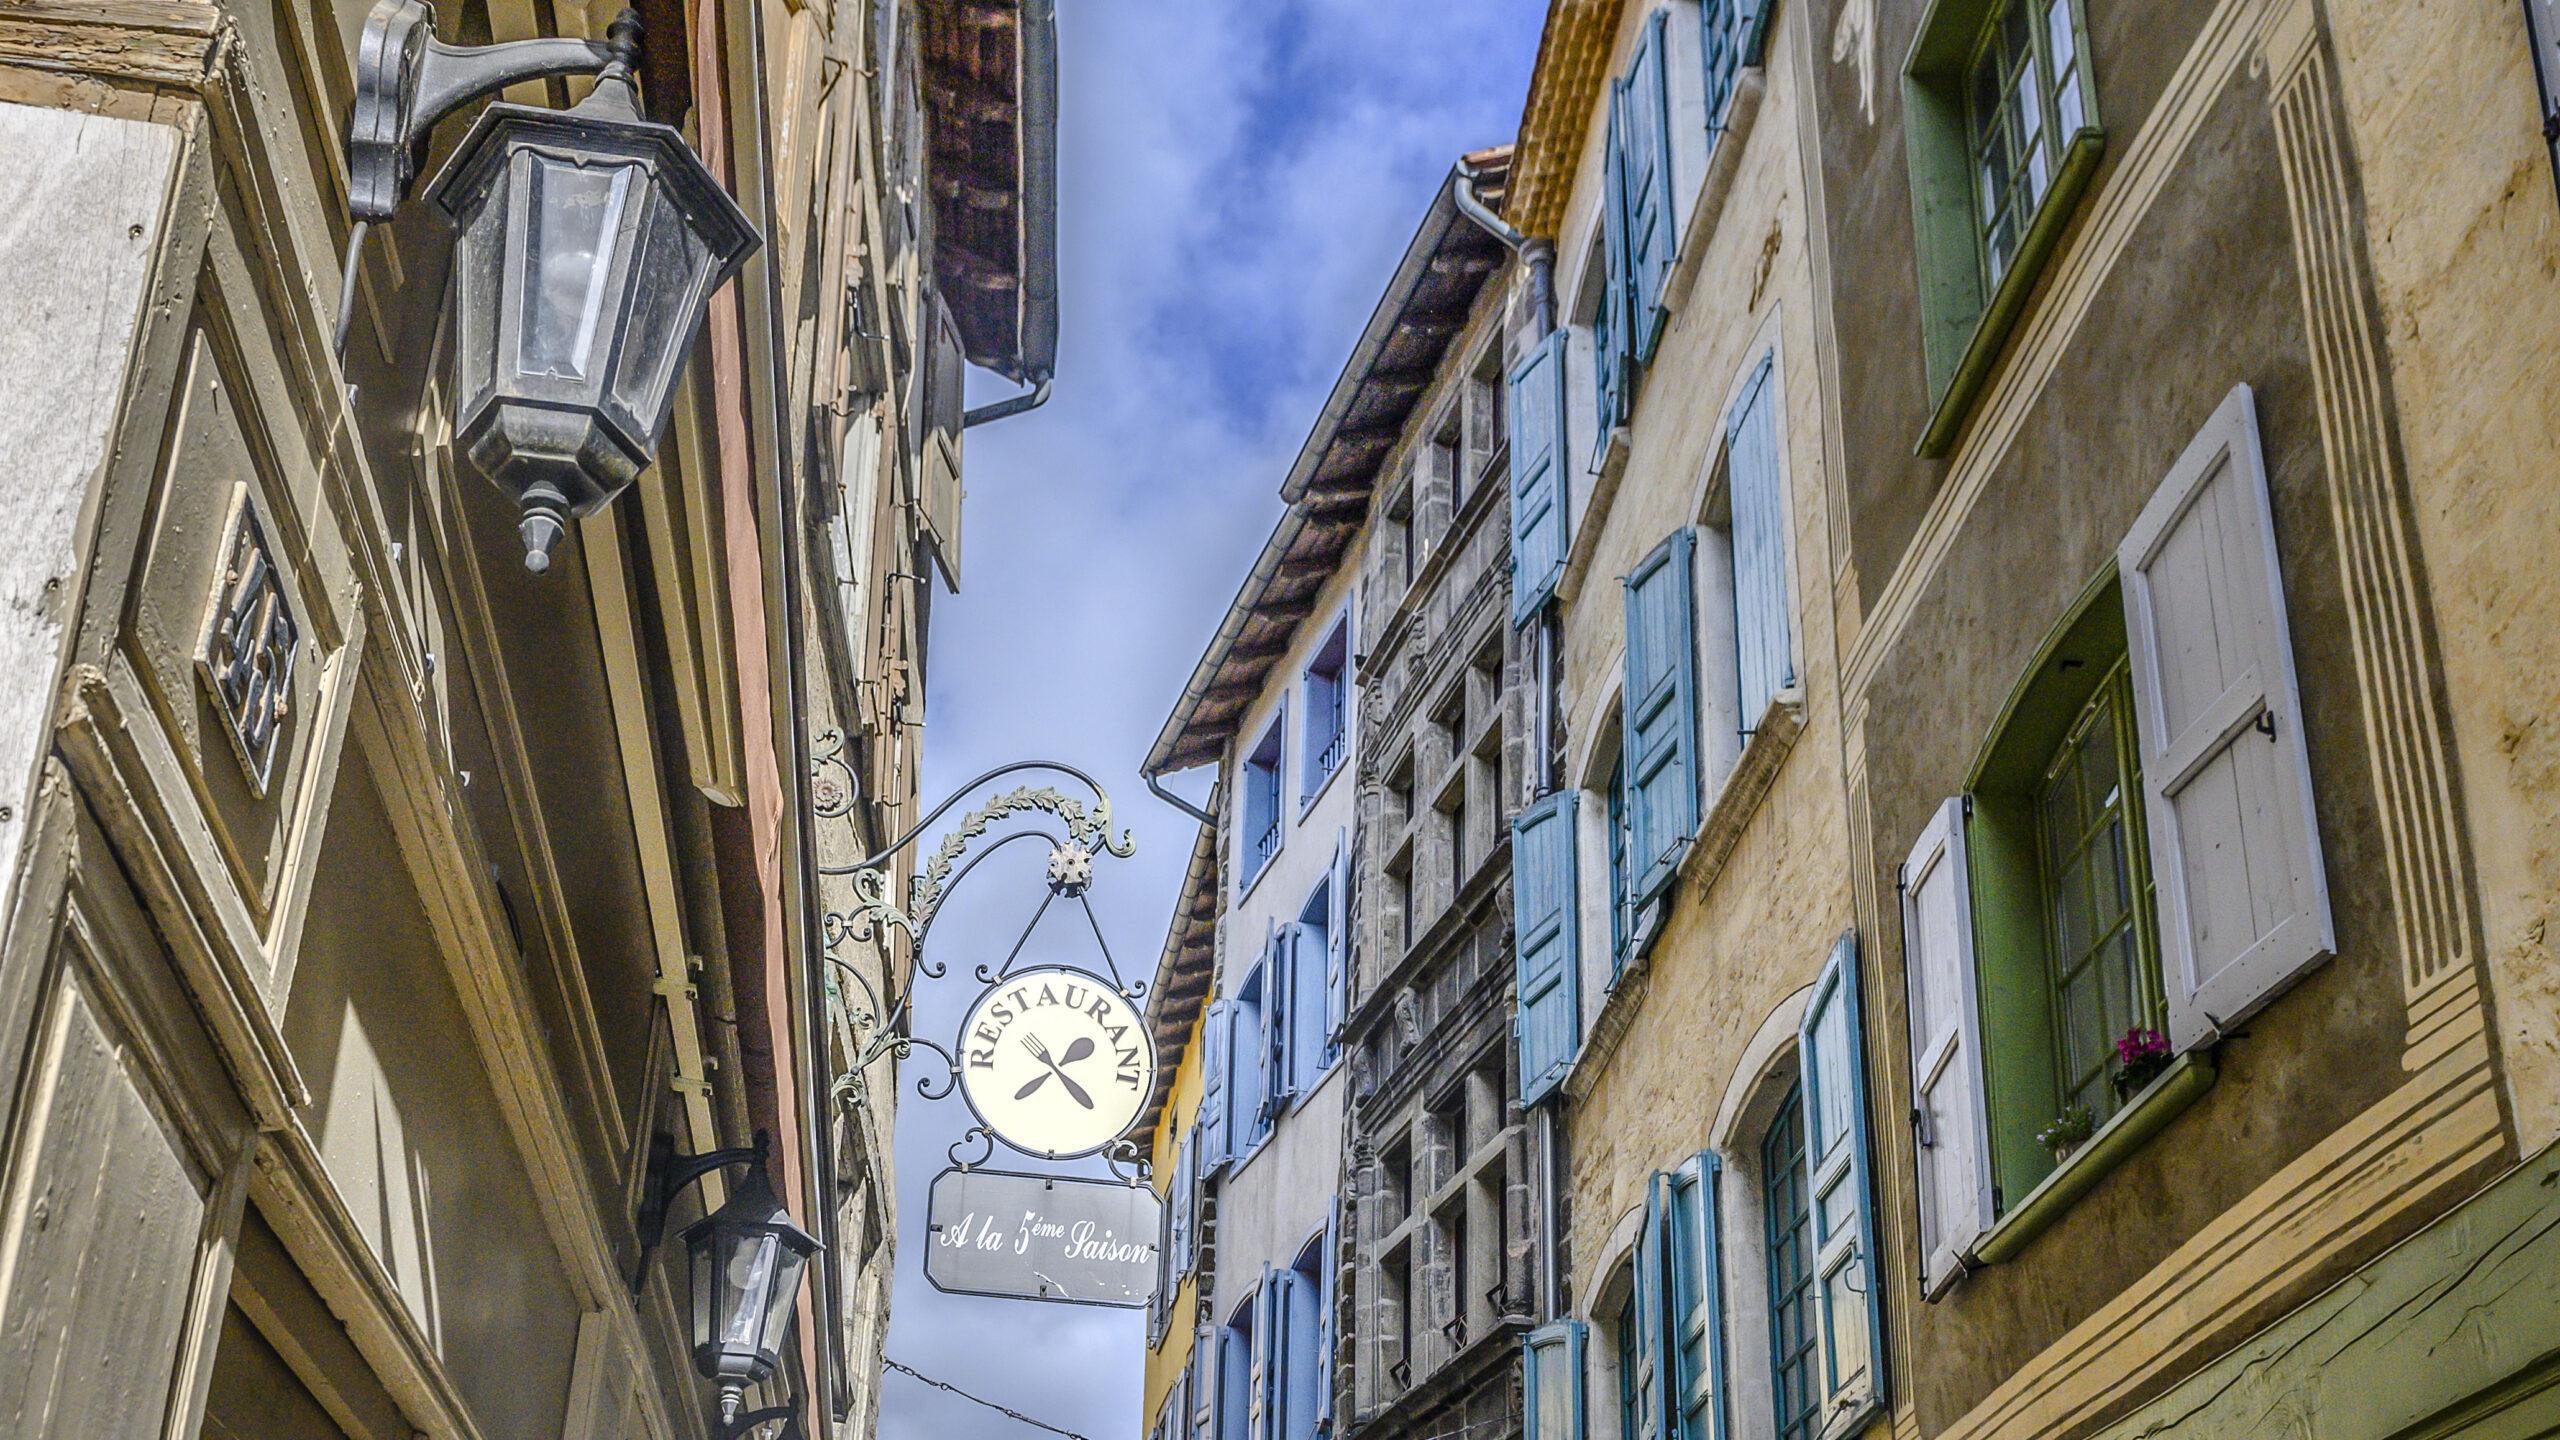 Le Puy-en-Velay: Restaurantschild in der Unterstadt. Foto: Hilke Maunder